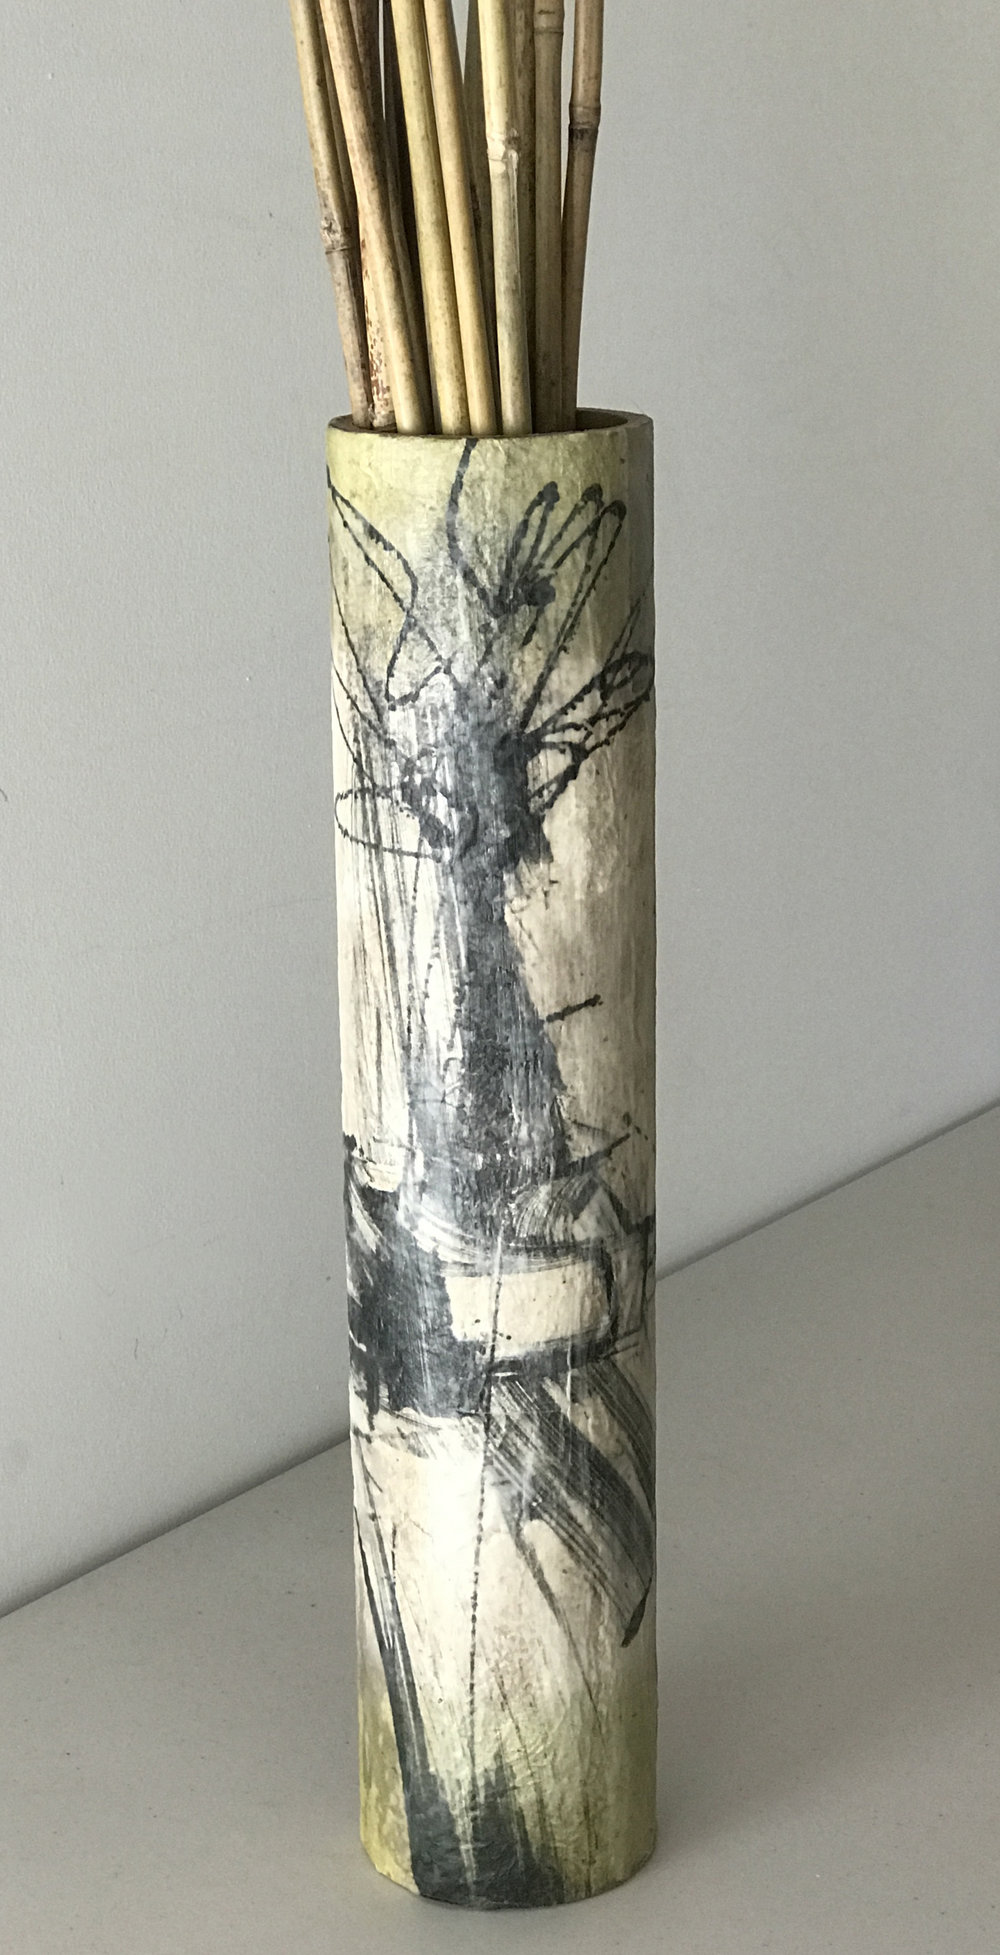 Vase of Bamboo